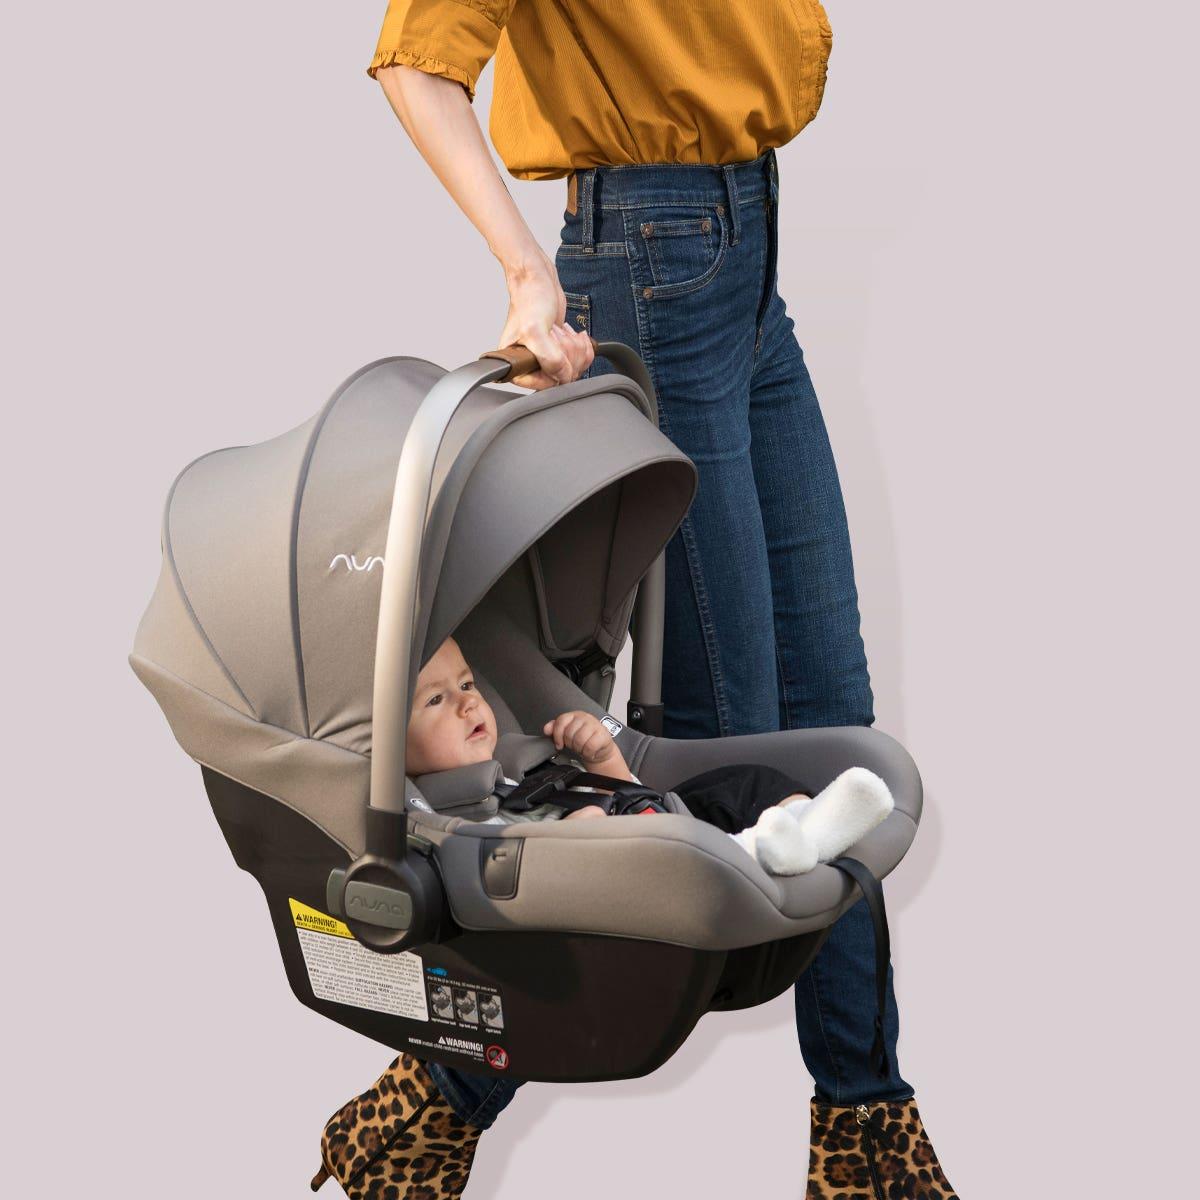 Woman holding Nuna PIPA lite r car seat with baby